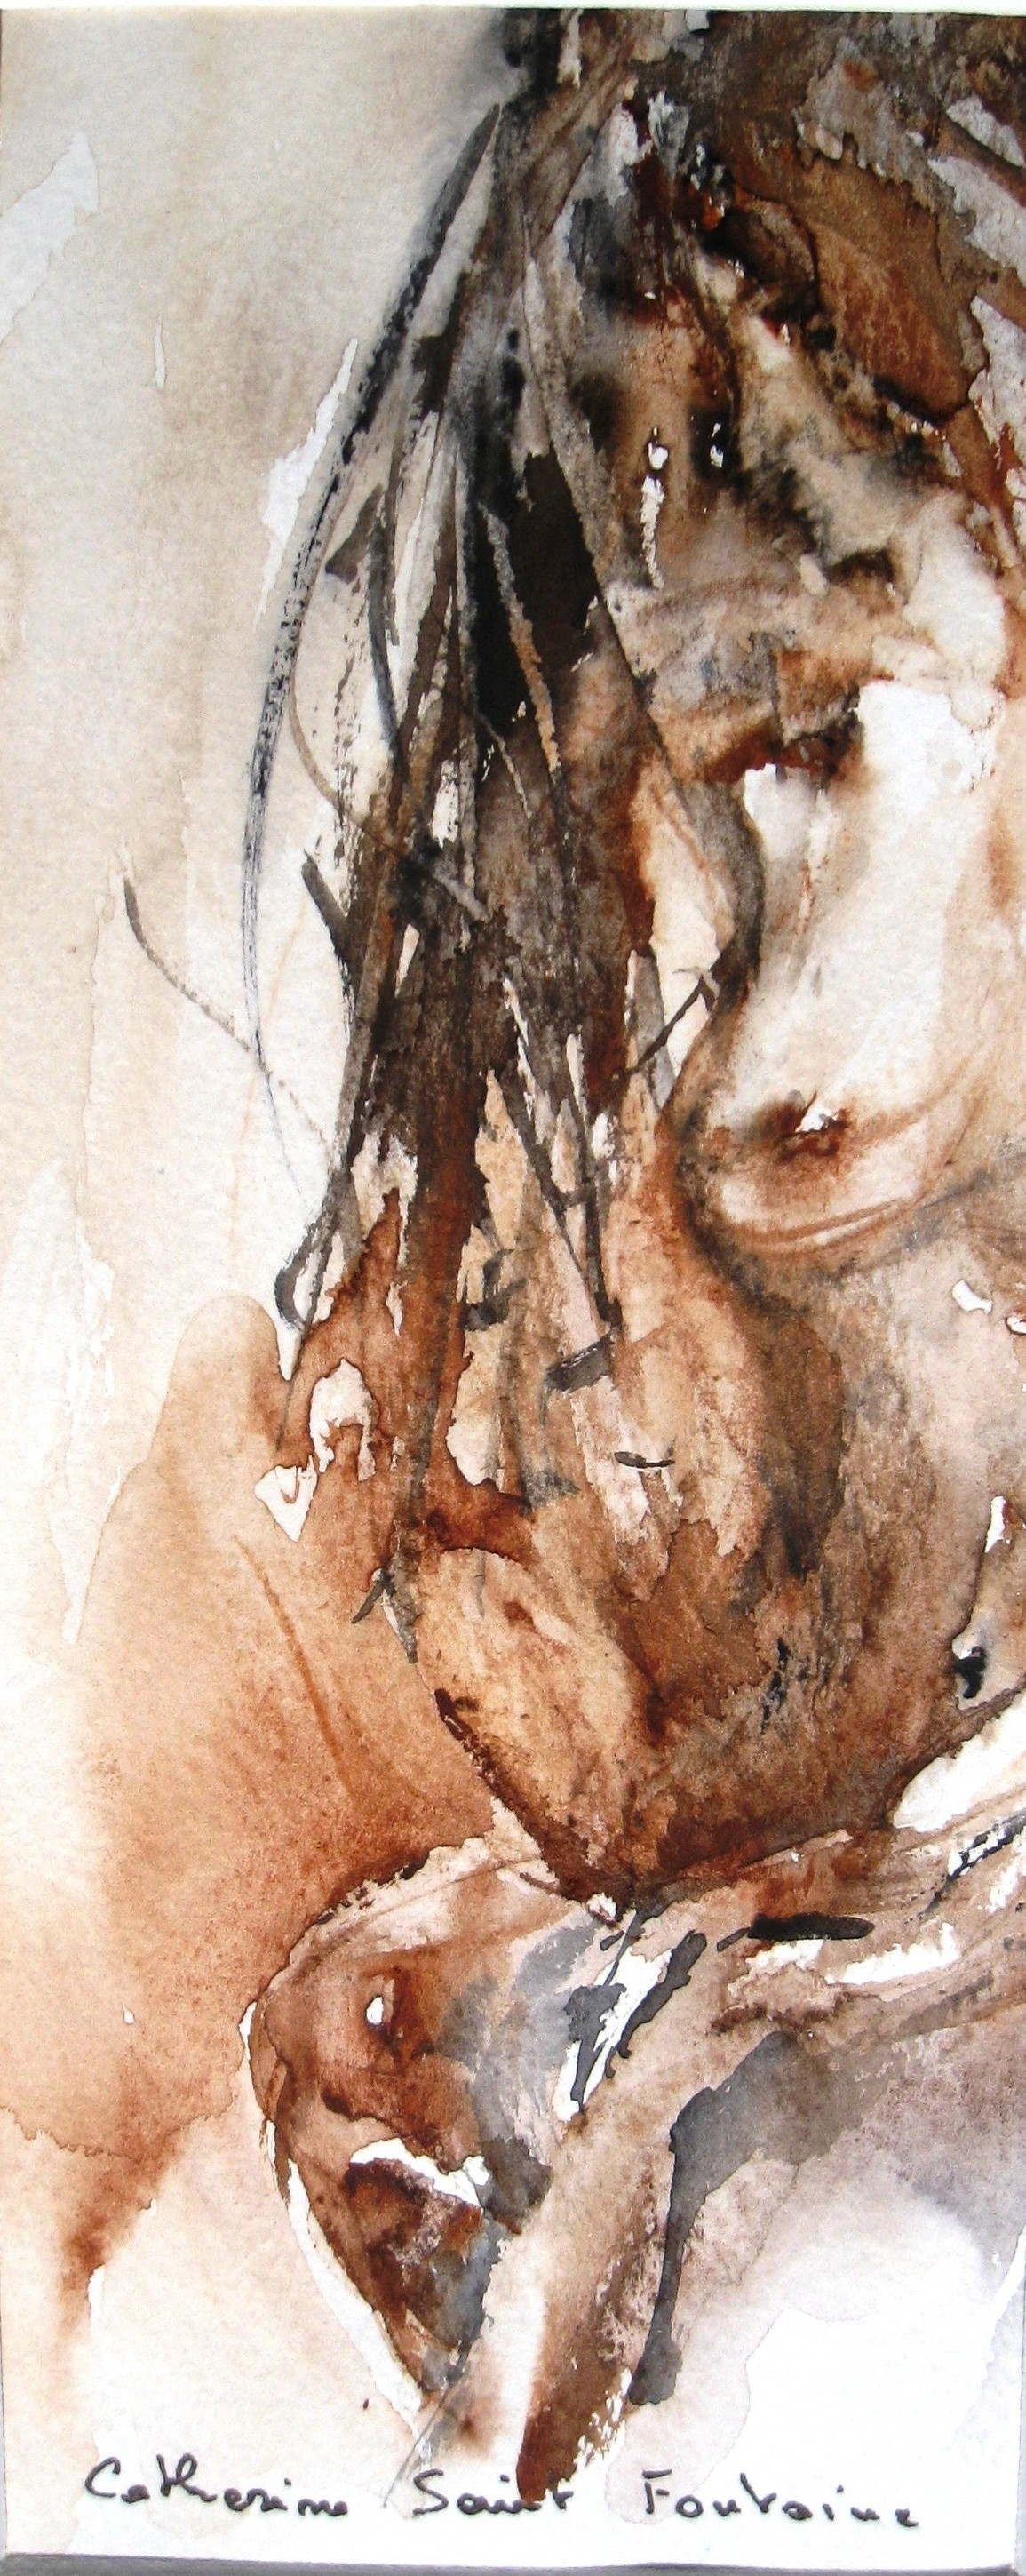 Catherinesaintfontaine - la face cachée